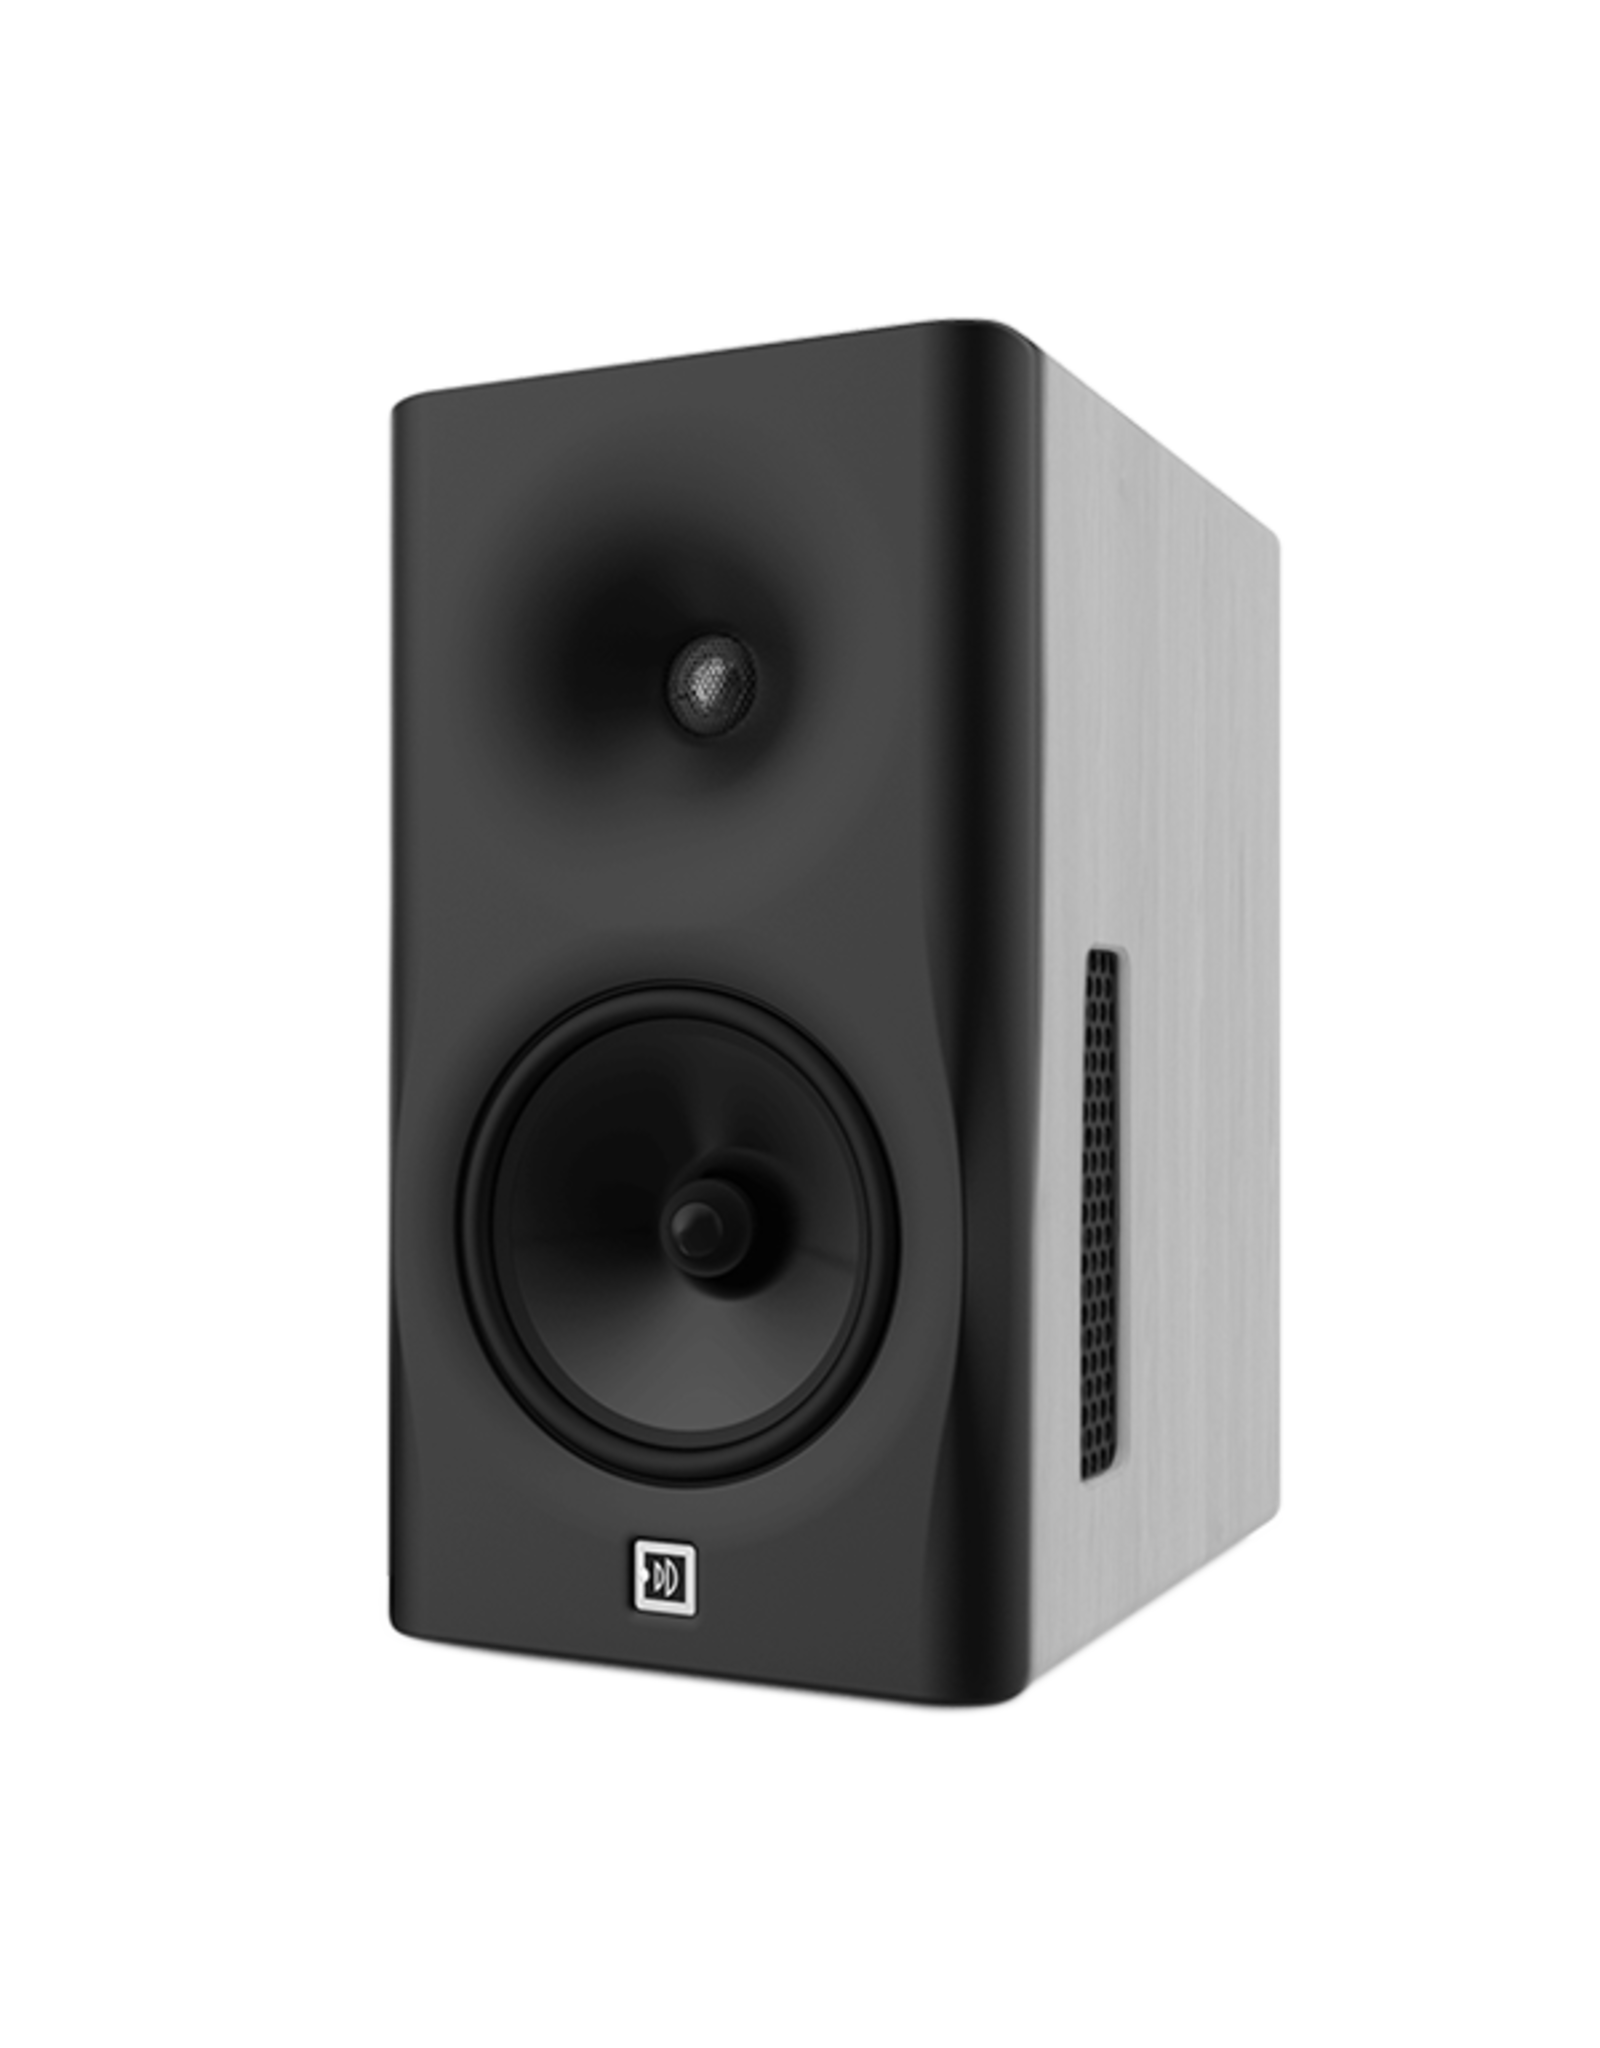 Dutch & Dutch 8C speaker, black baffle, white cabinet